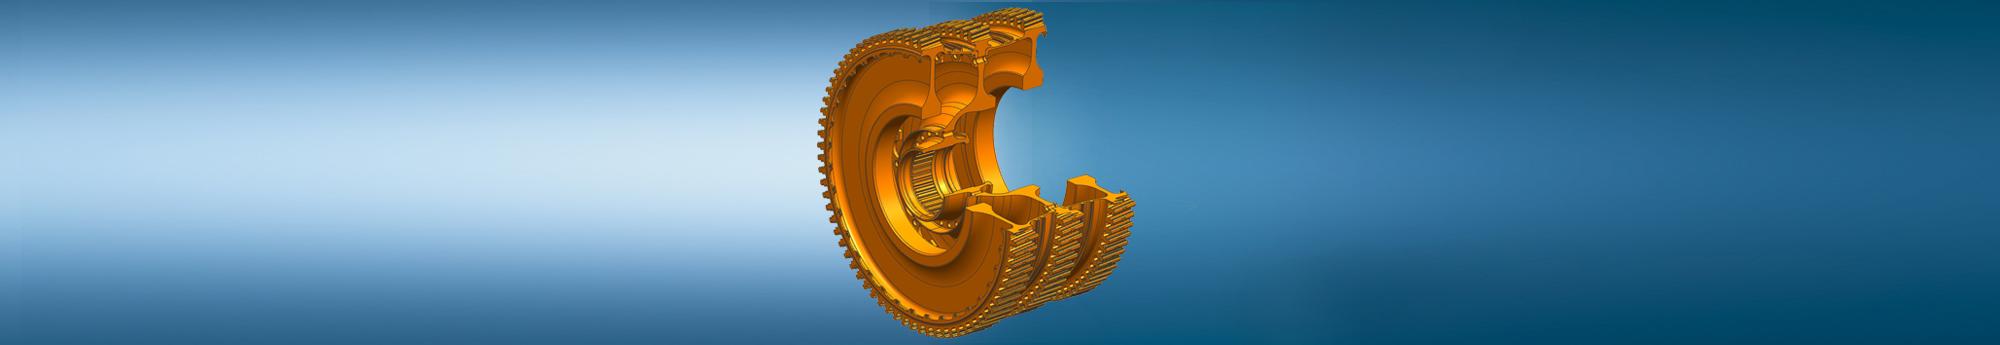 Mechanical Design - MTU Aero Engines